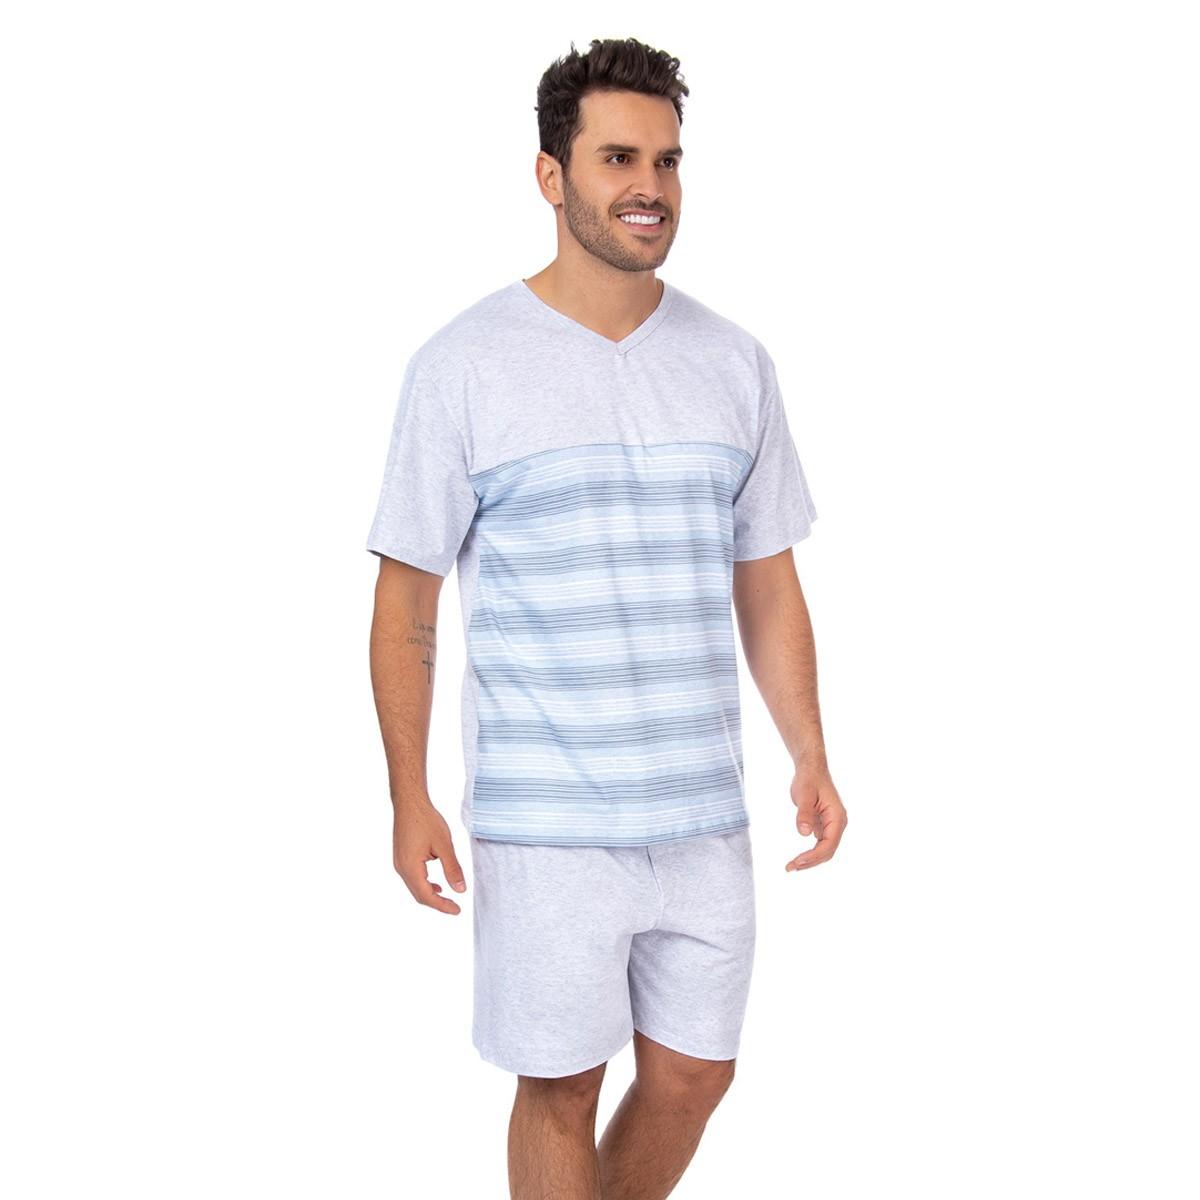 Pijama masculino manga curta e bermuda em algodão Victory